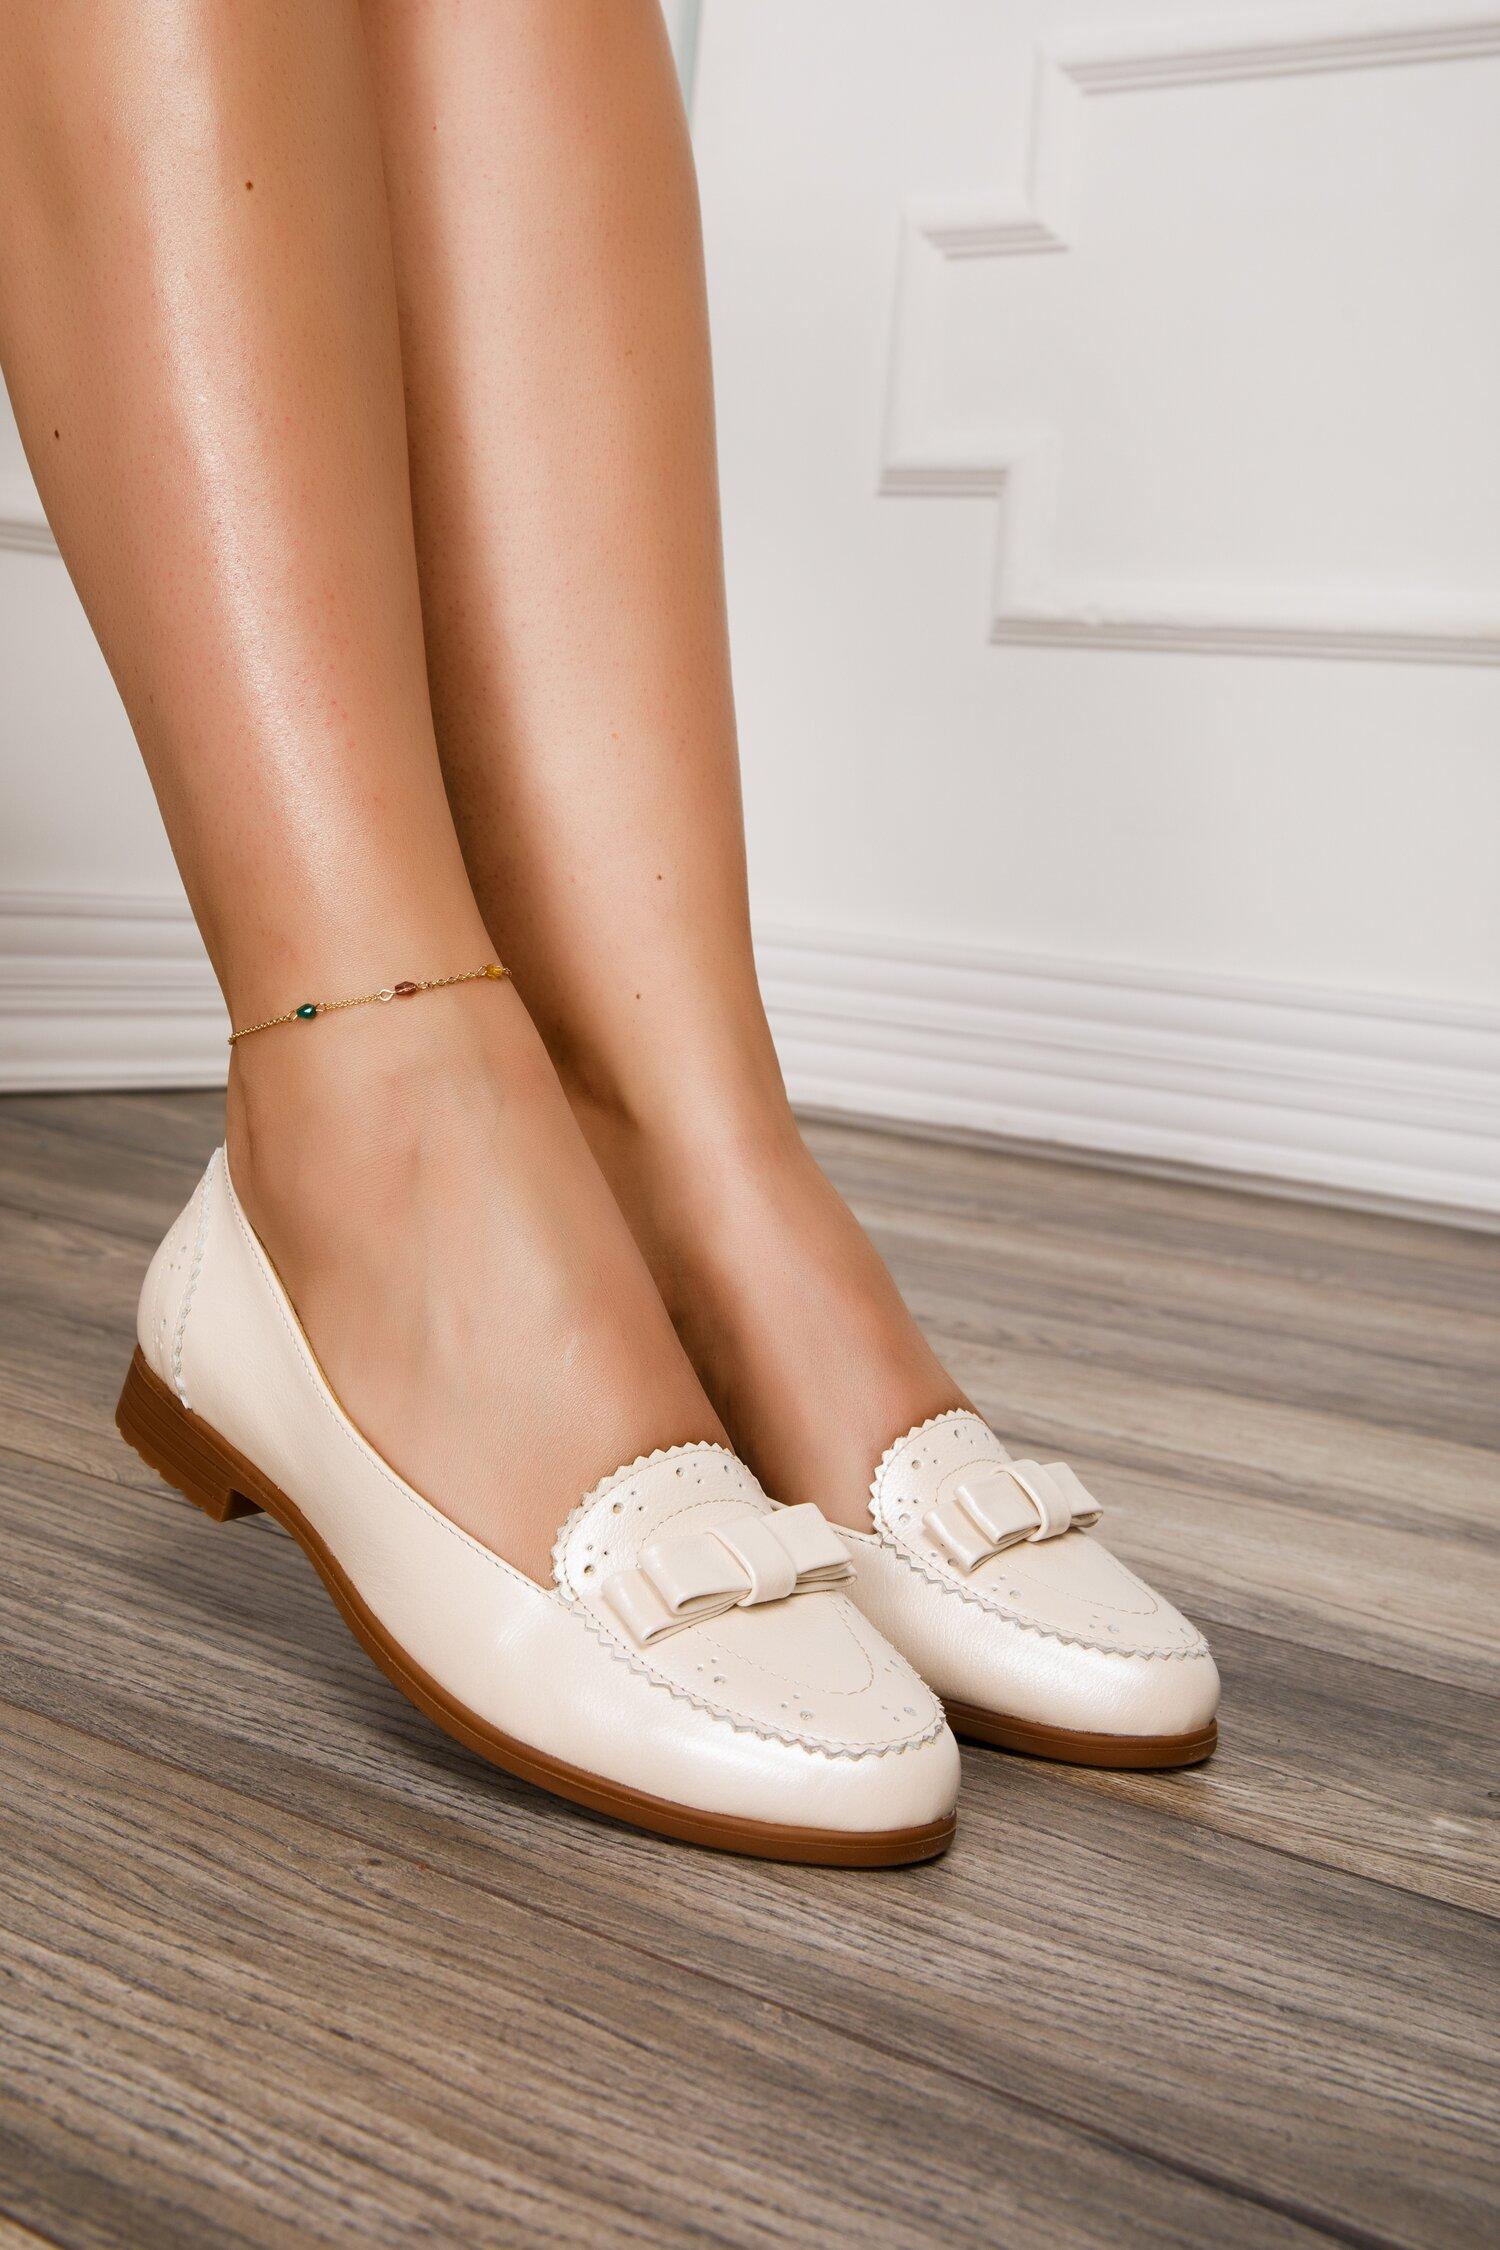 Pantofi bej sidefat cu fundita la varf si design cu perforatii imagine